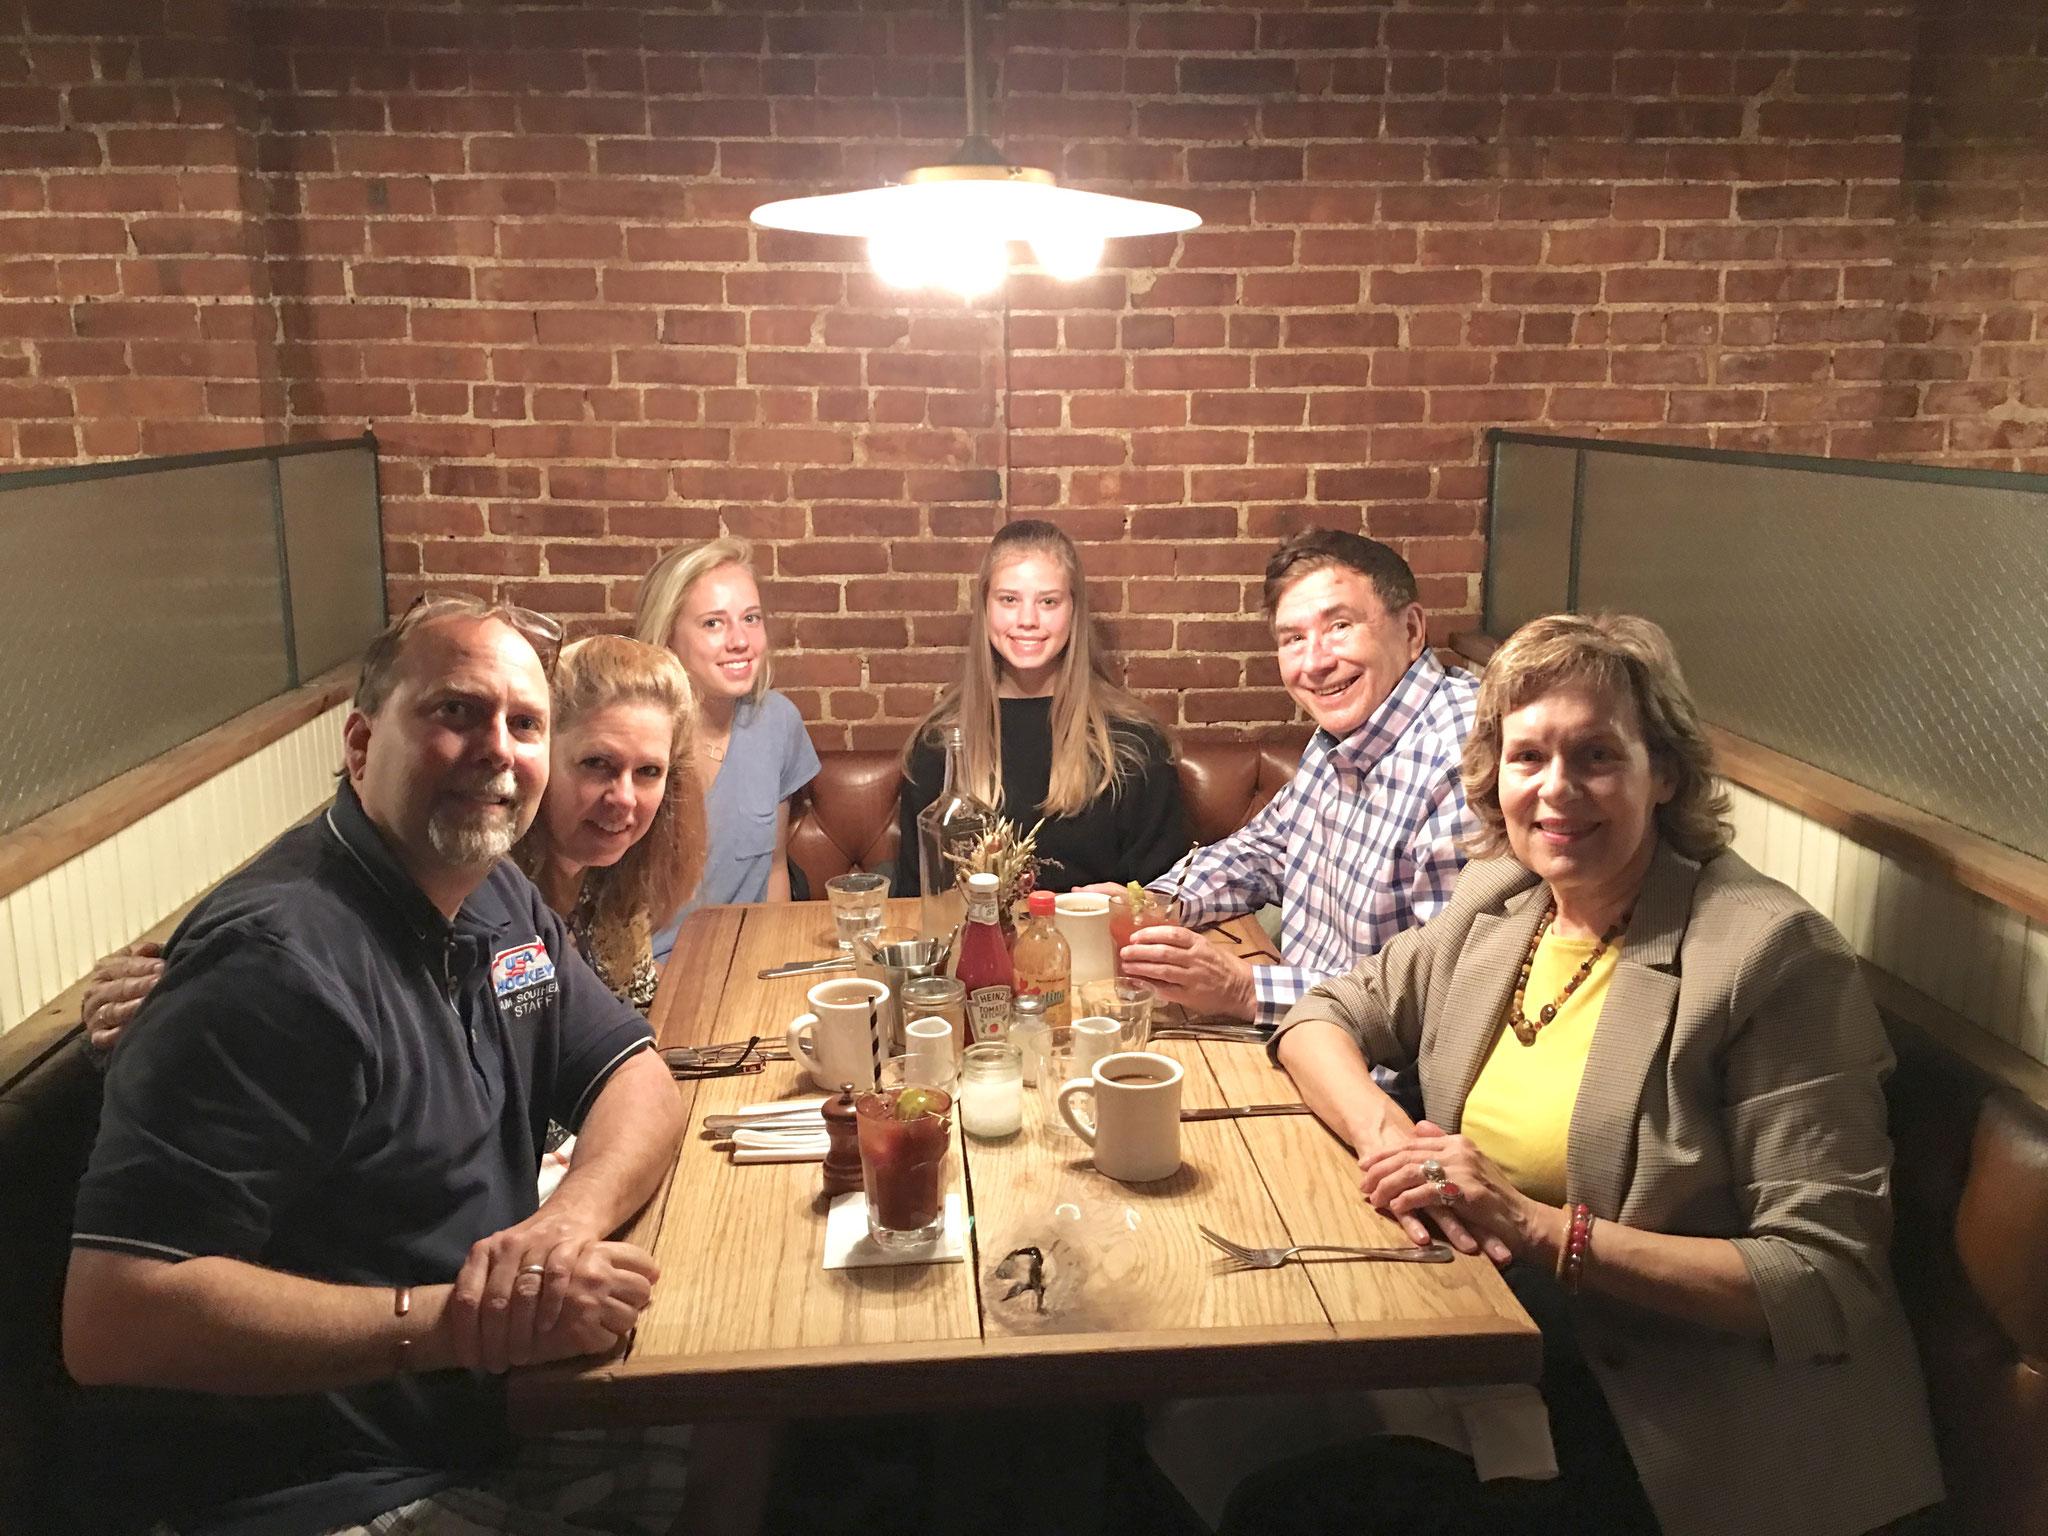 NYC, spring 2019 Jerry Sroka, Lisa, Brooke, Brianna, John & Lorraine